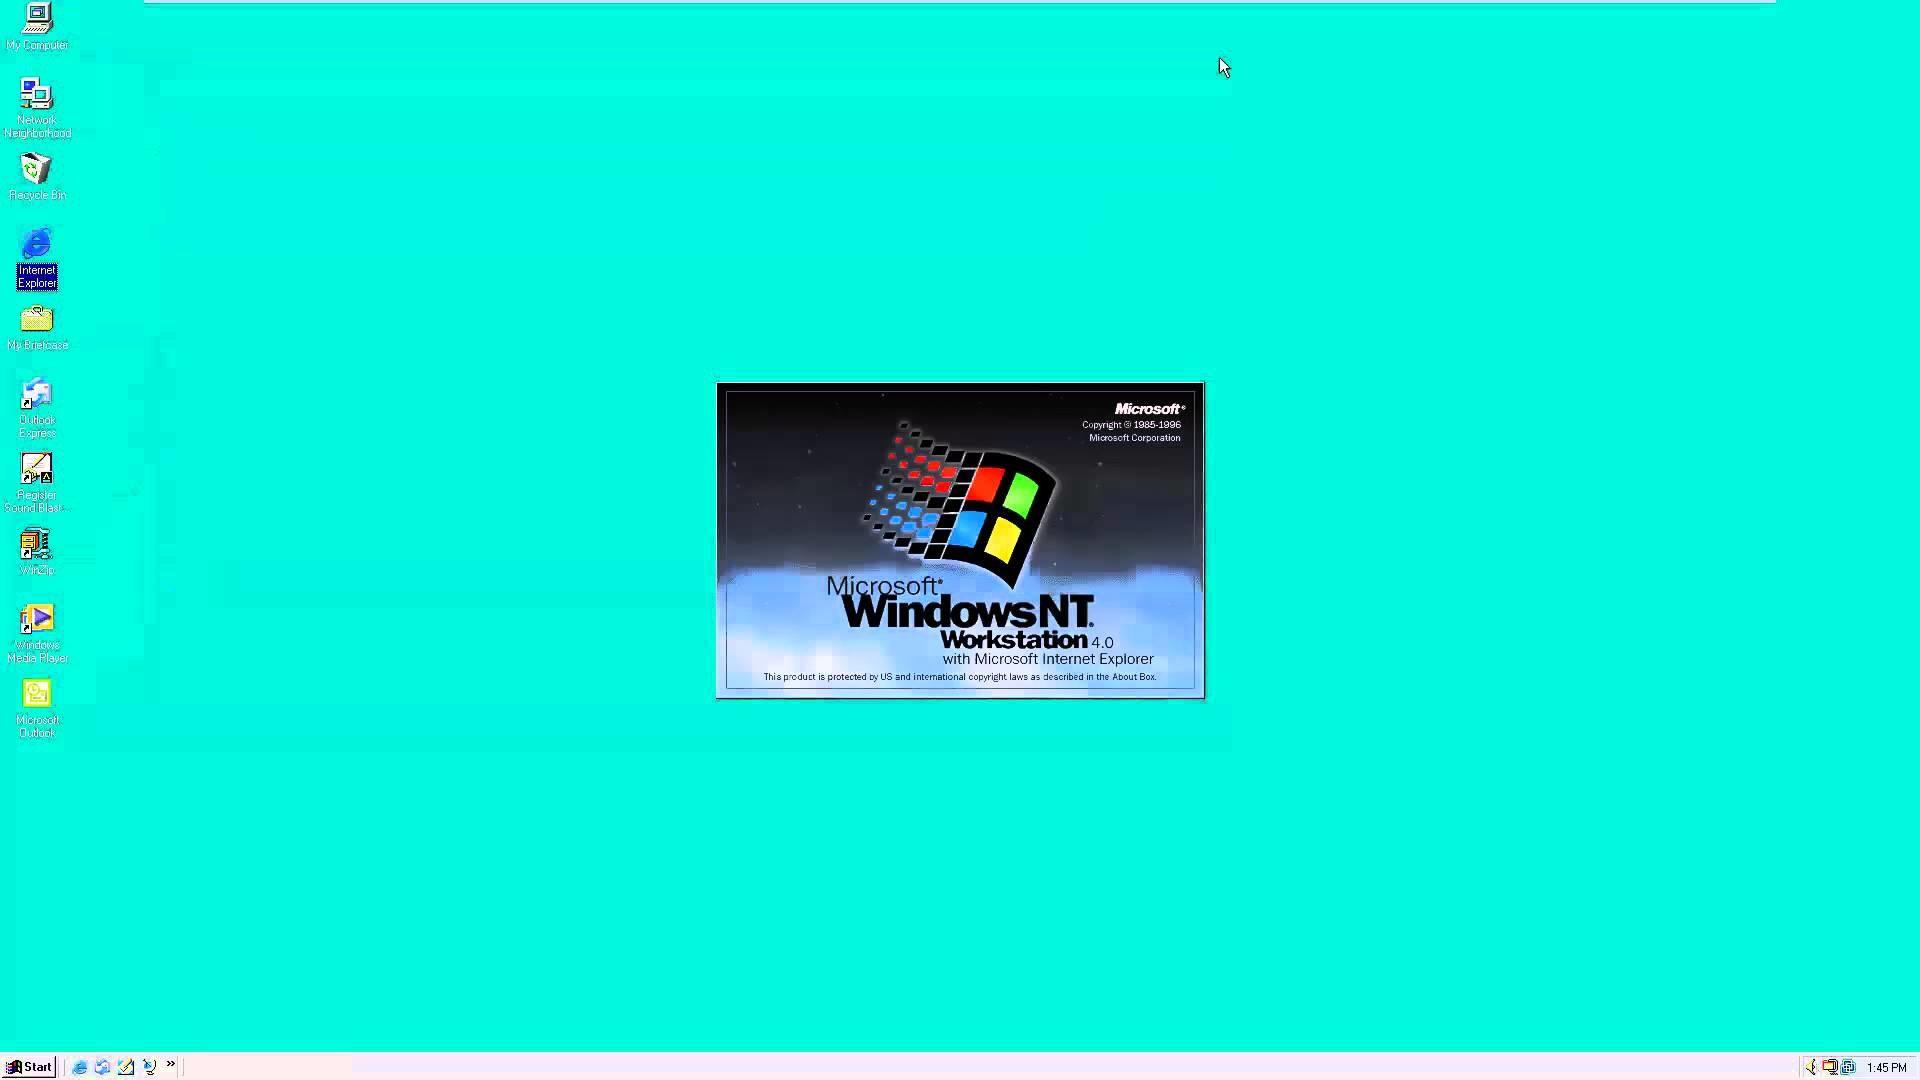 Windows NT Workstation 4.0 SP6 in VMware Workstation 12.0 (full 1080p)